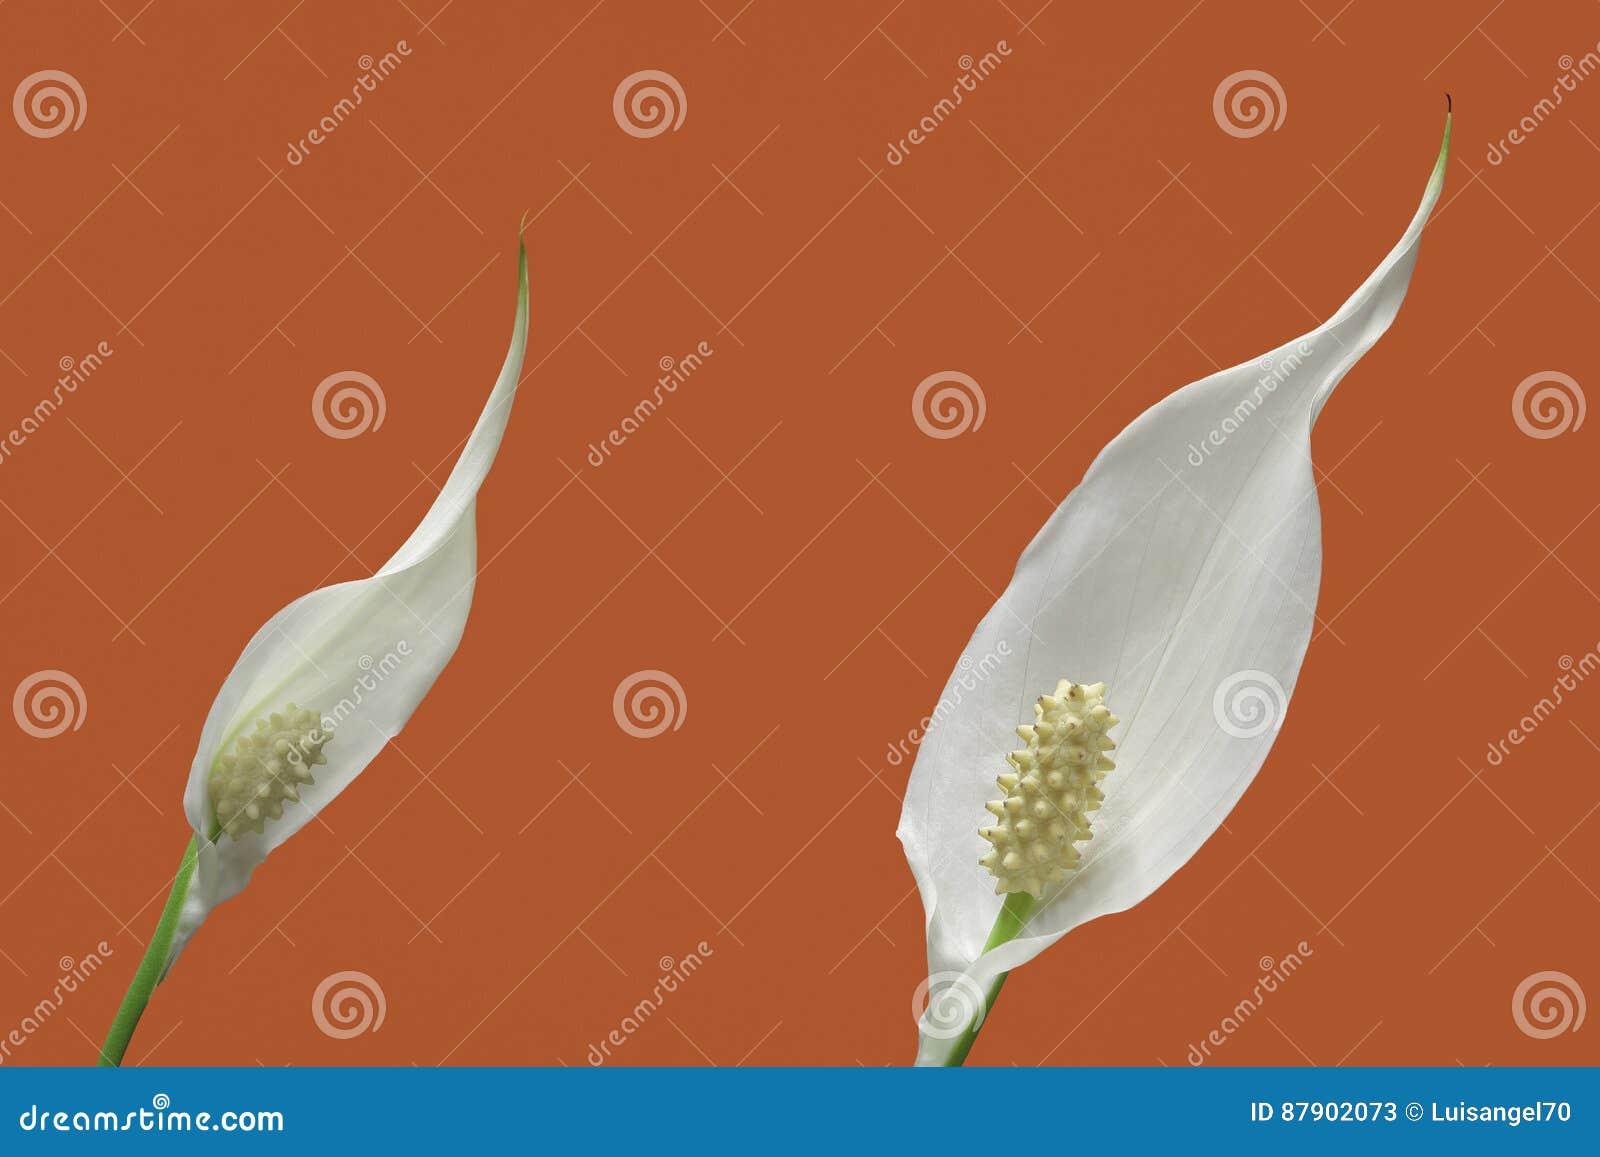 Peace lily plant flowers stock image image of orange 87902073 download comp izmirmasajfo